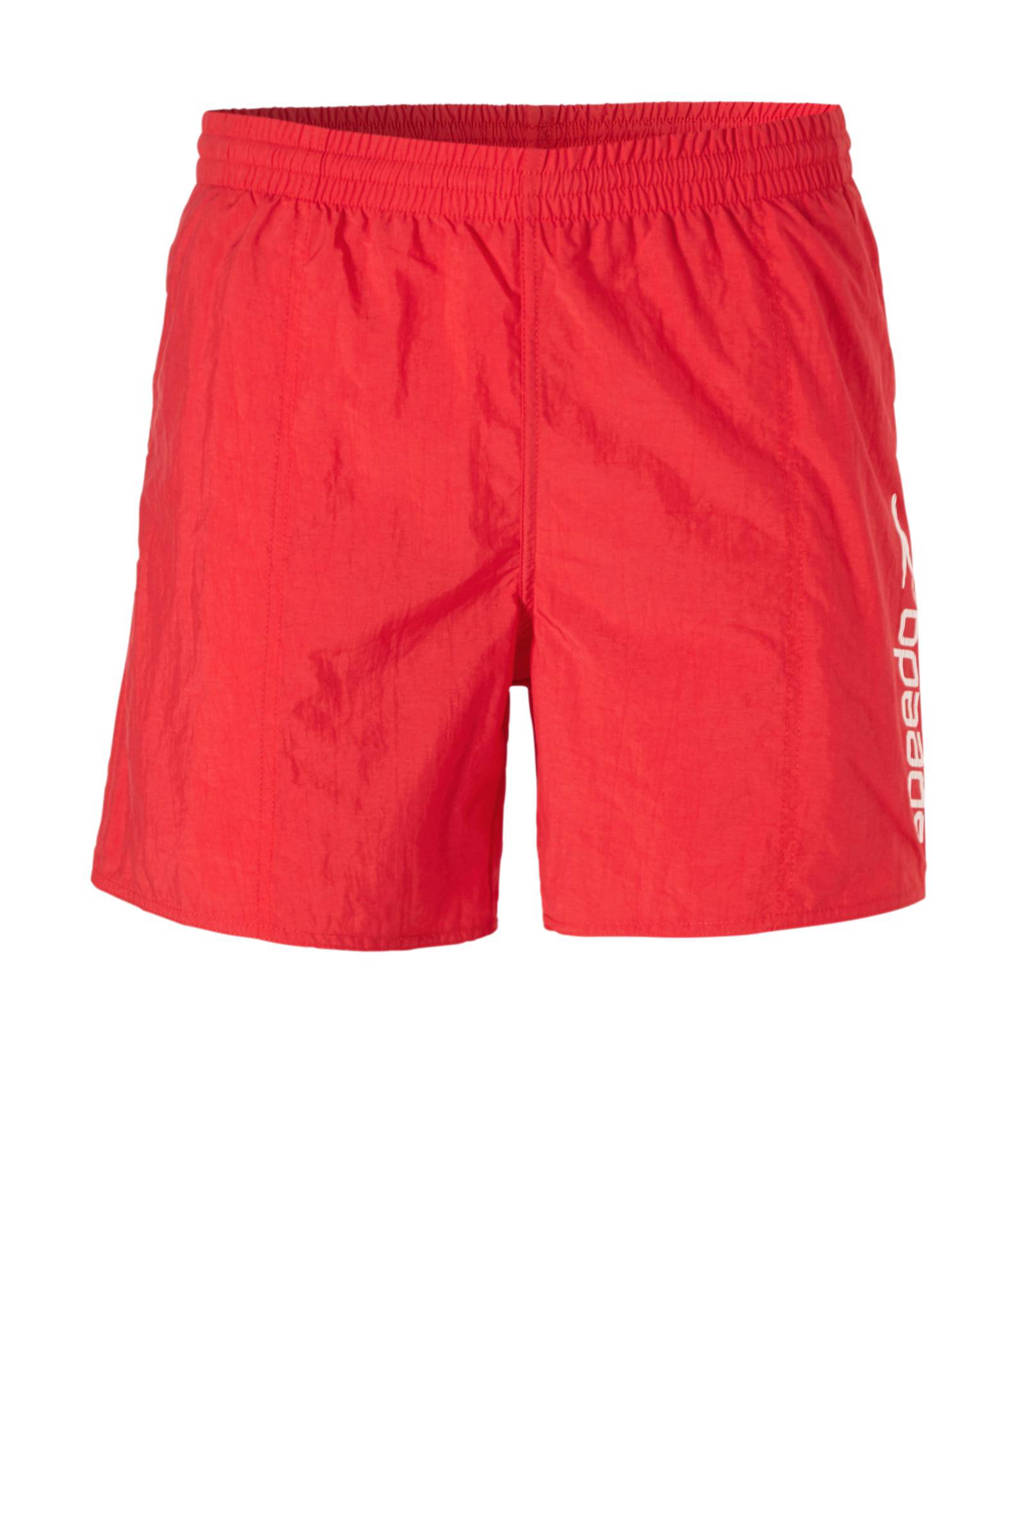 Speedo zwemshort Scope rood, Rood/wit